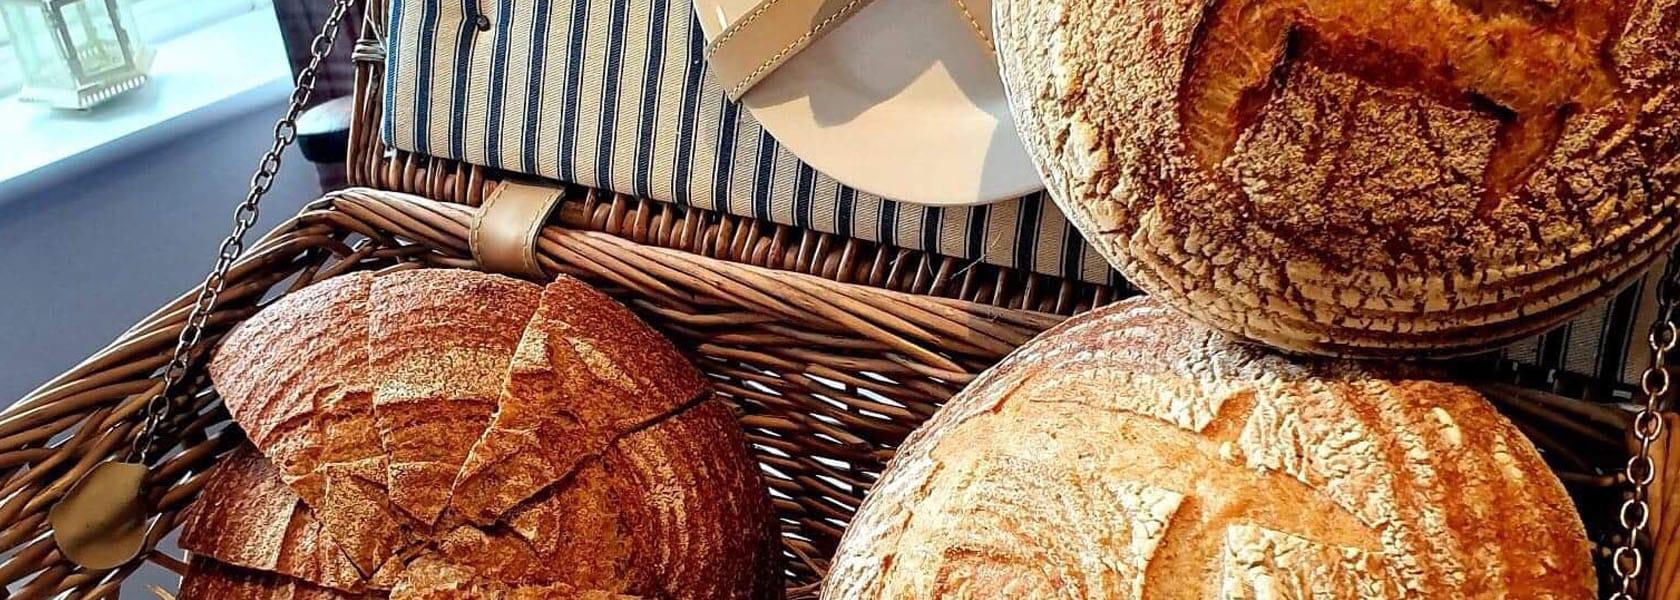 Dining_Bread_1680px